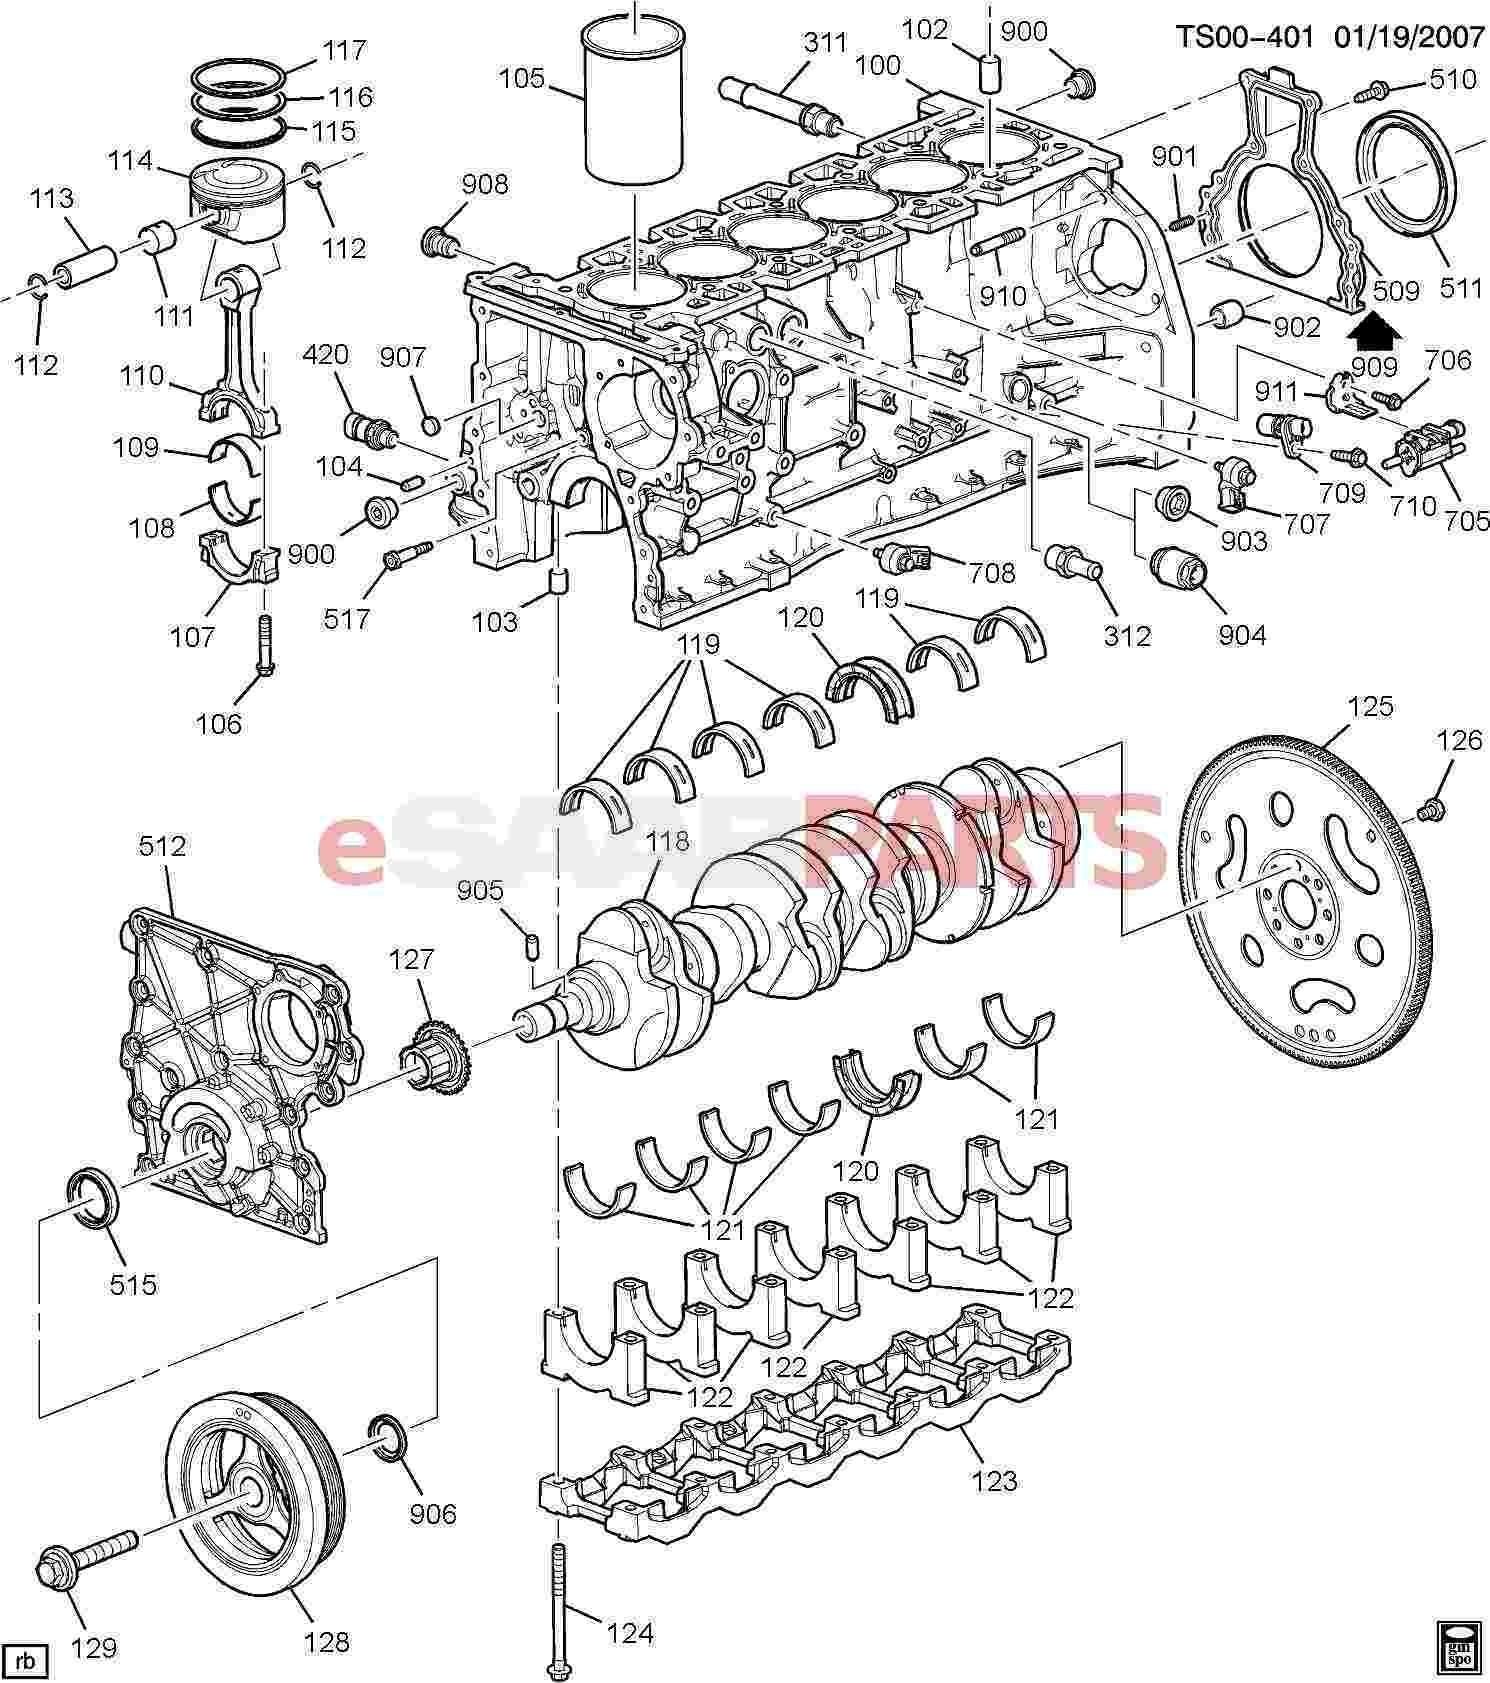 2003 Chevy Trailblazer Parts Diagram 2003 Chevy Trailblazer Engine Diagram 2003 Chevy Trailblazer Engine